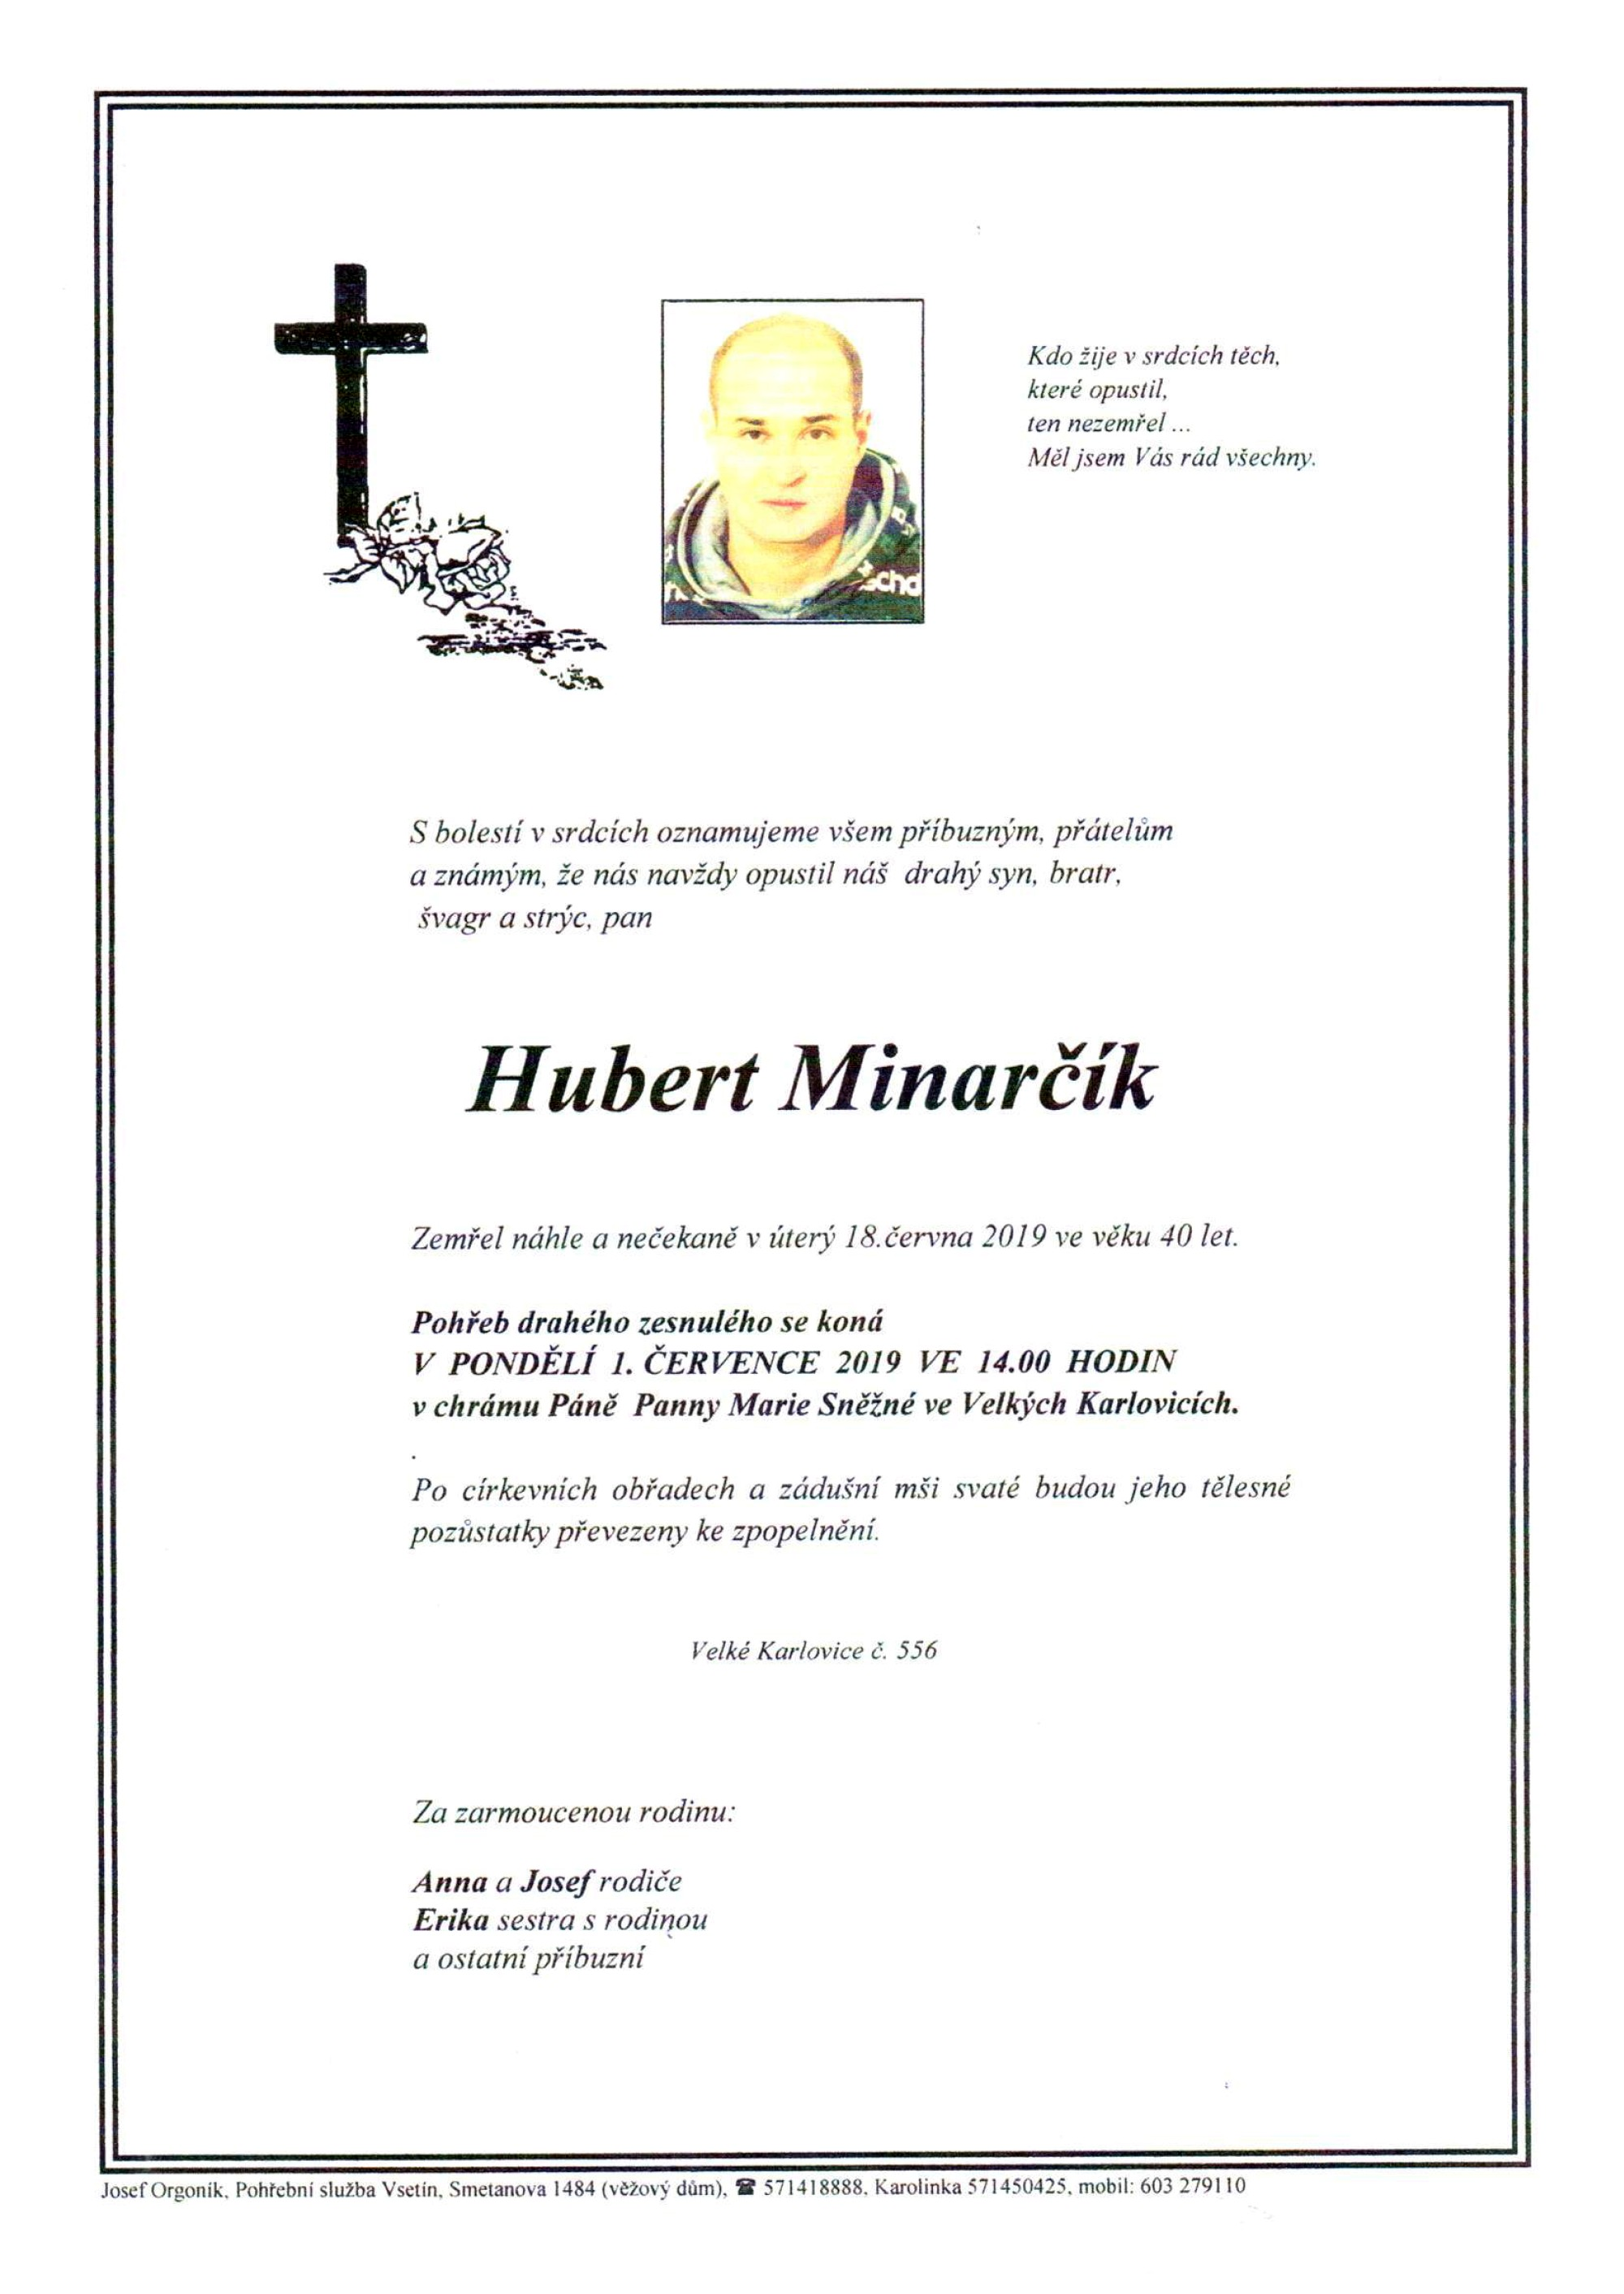 Hubert Minarčík